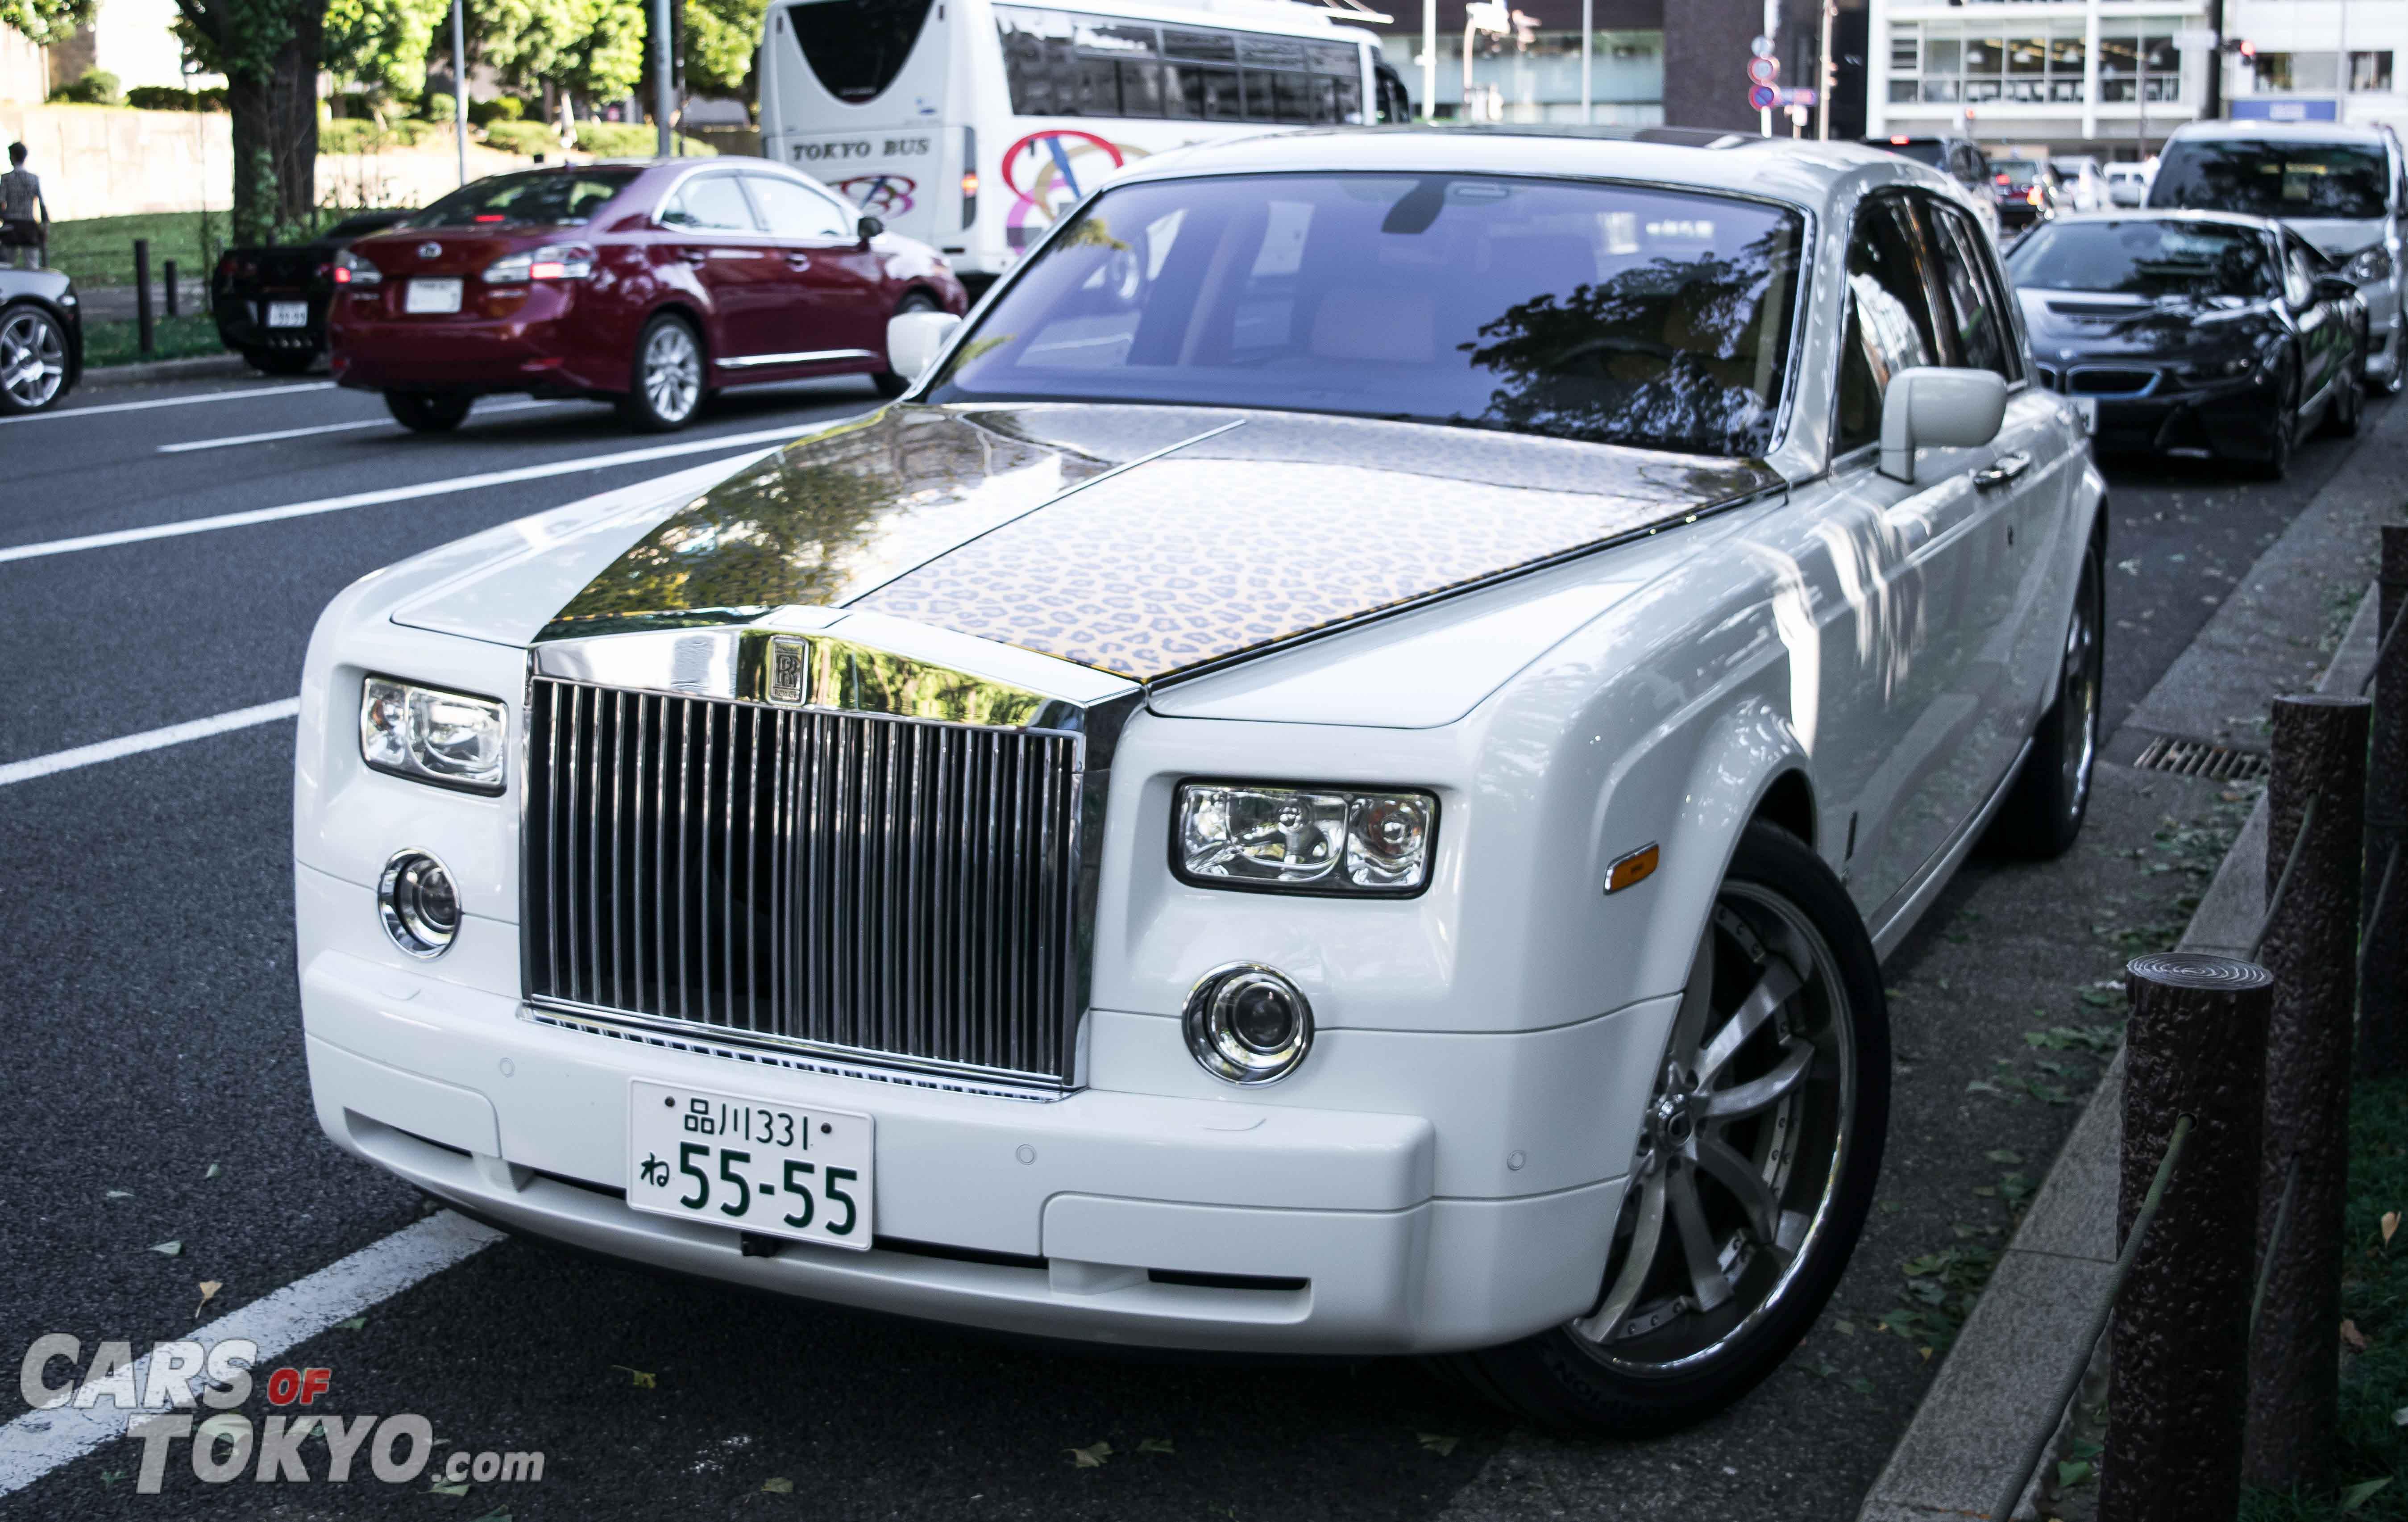 cars-of-tokyo-luxury-rolls-royce-phantom-leopoard